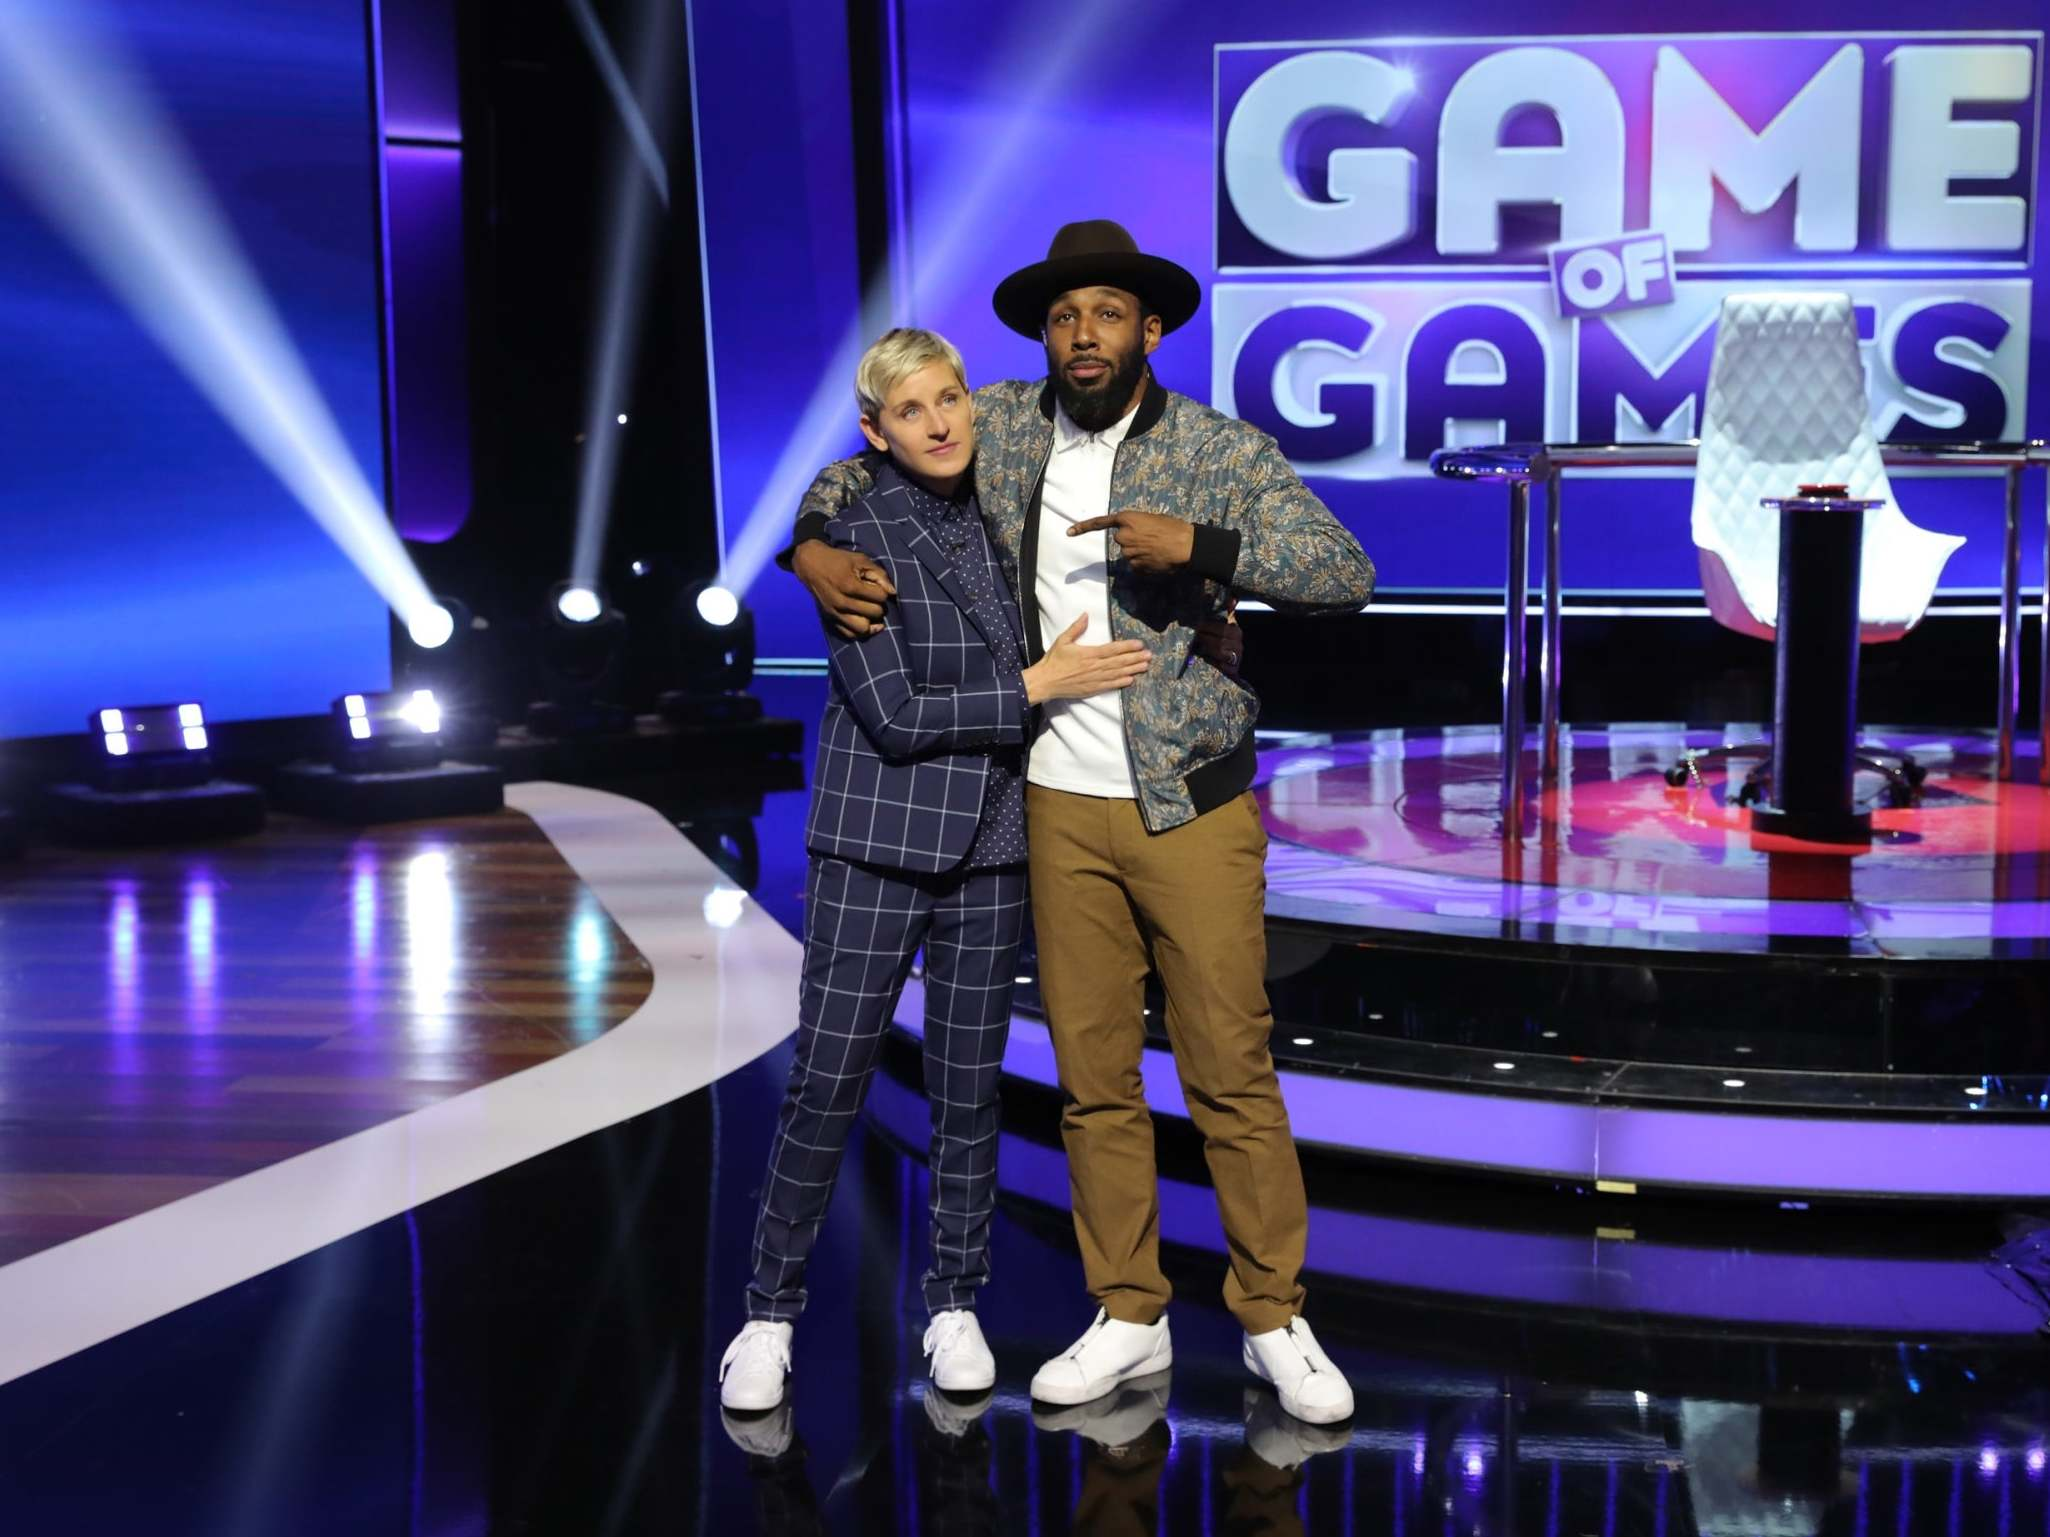 Ellen DeGeneres Show DJ 'tWitch' speaks out after allegations of 'toxicity'